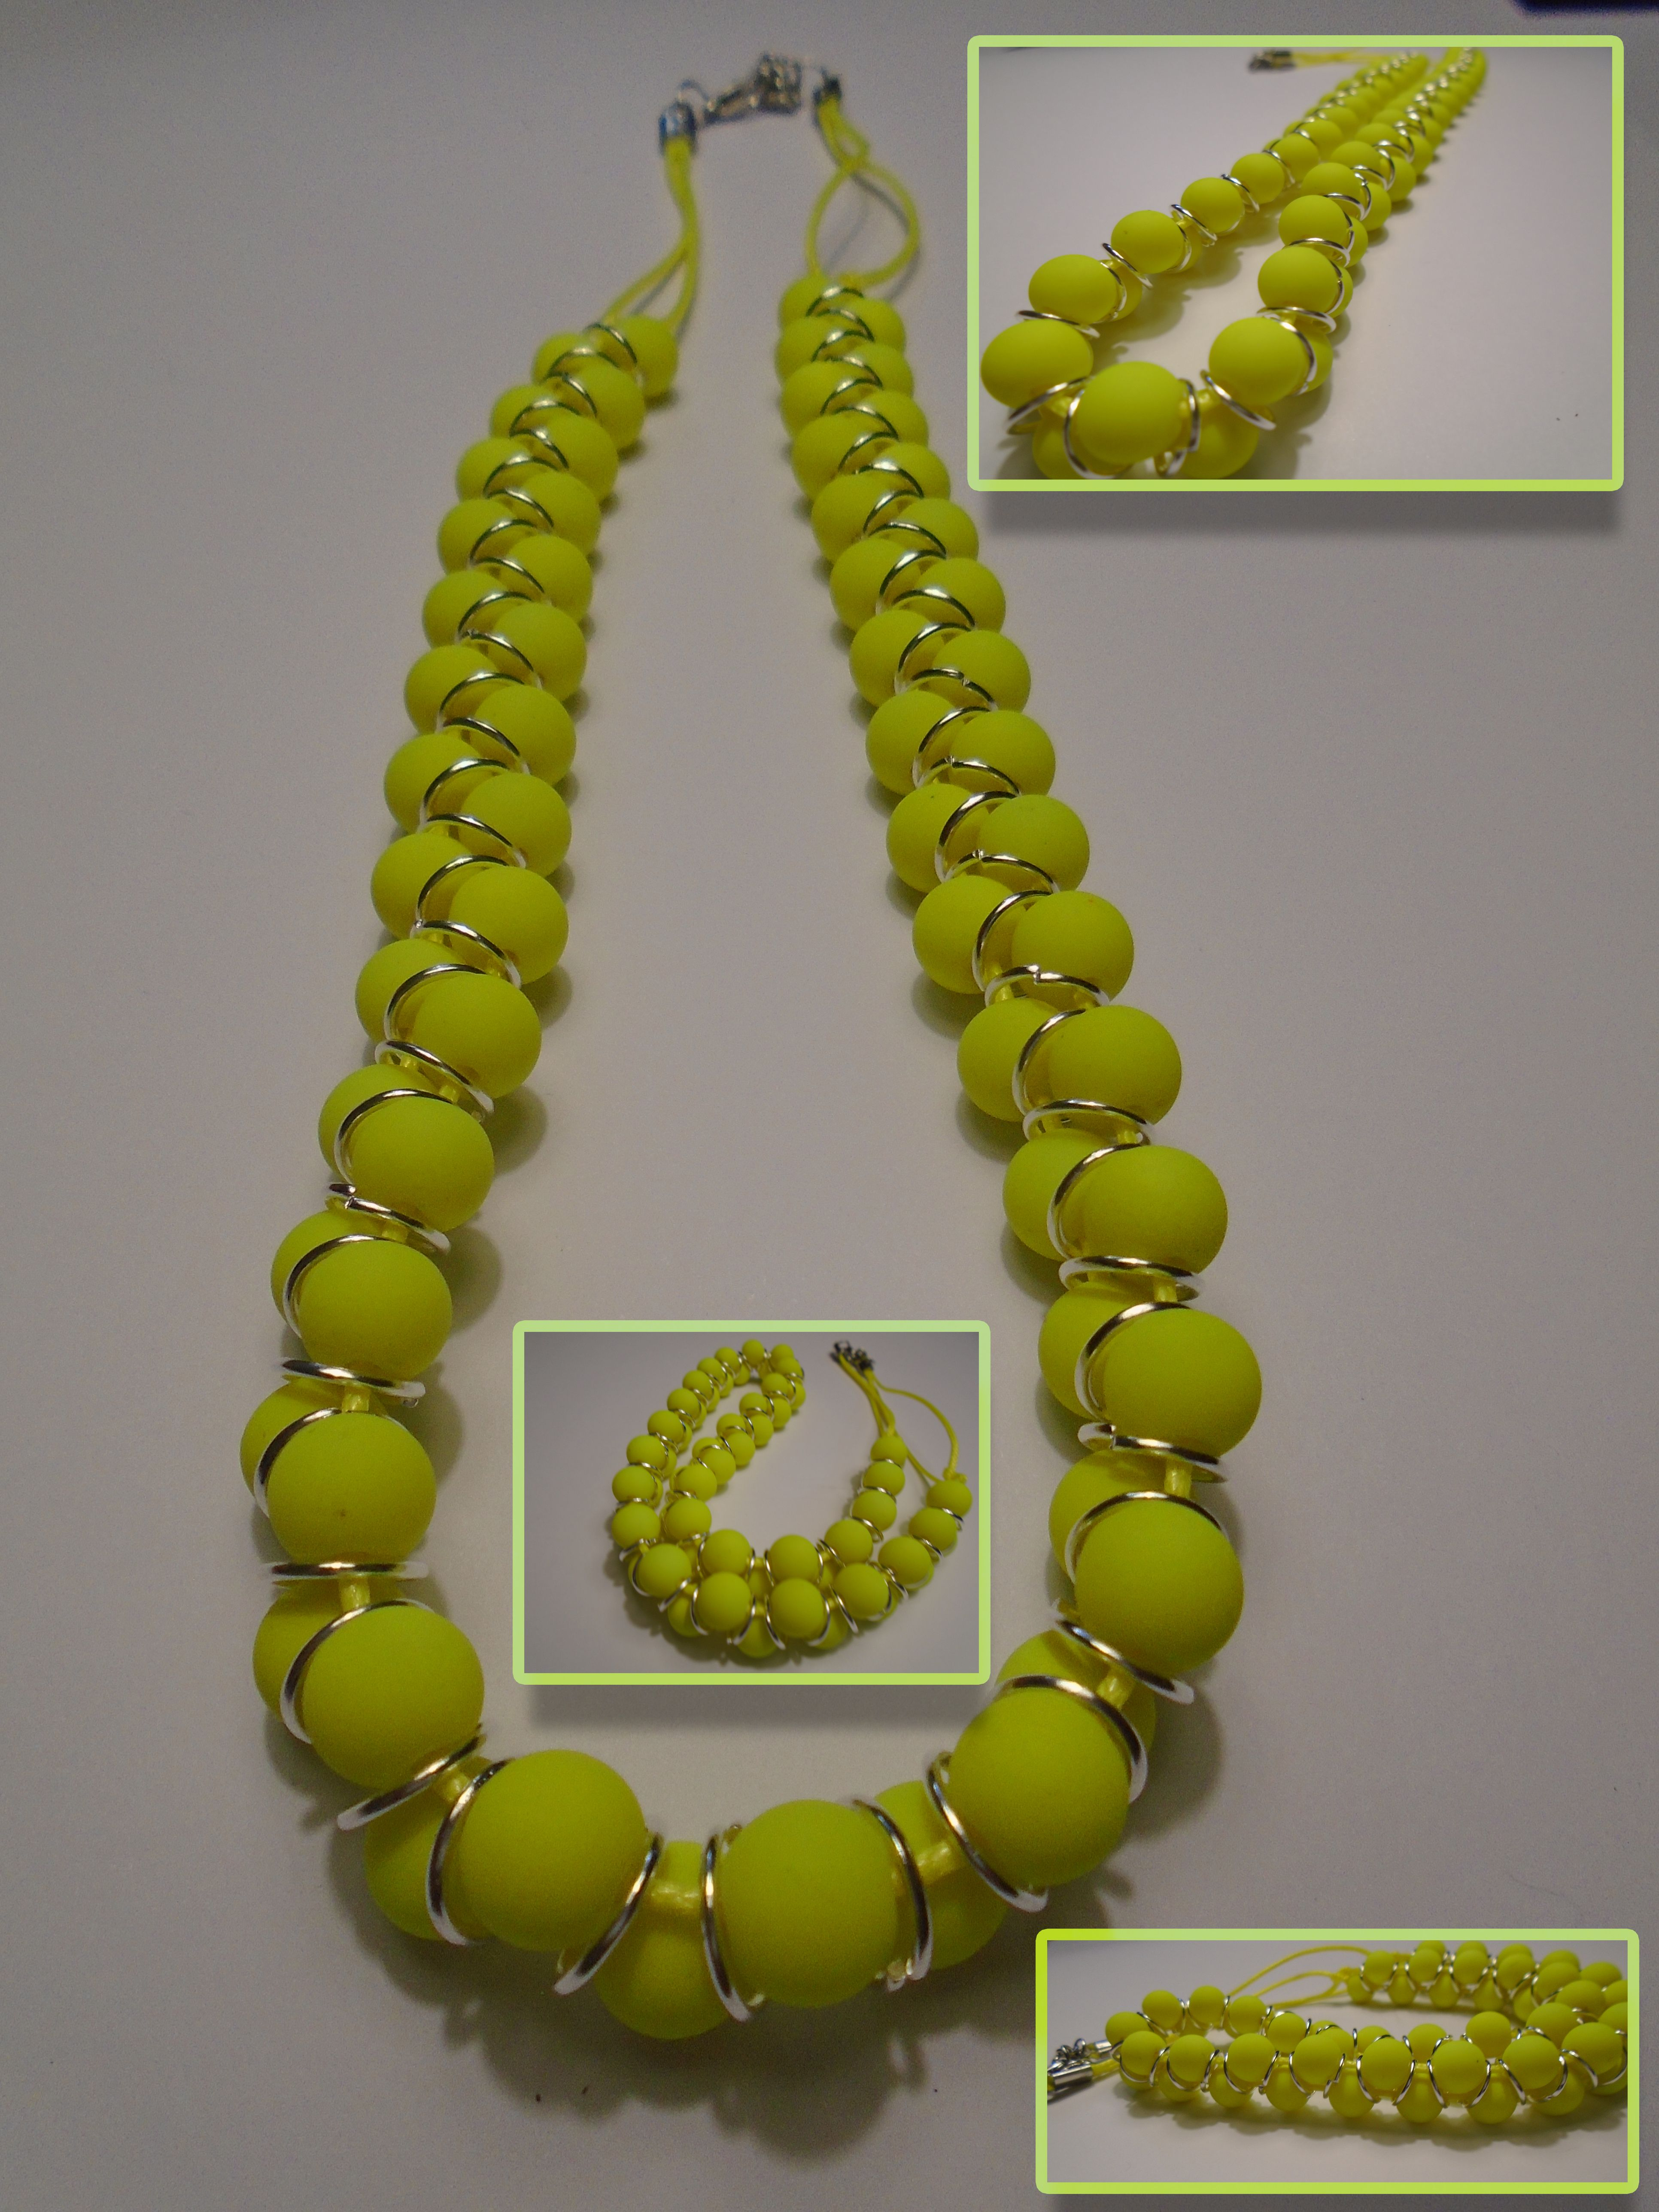 a651adc86567 Collar con bolas grandes de color amarillo unidas por anillas ...